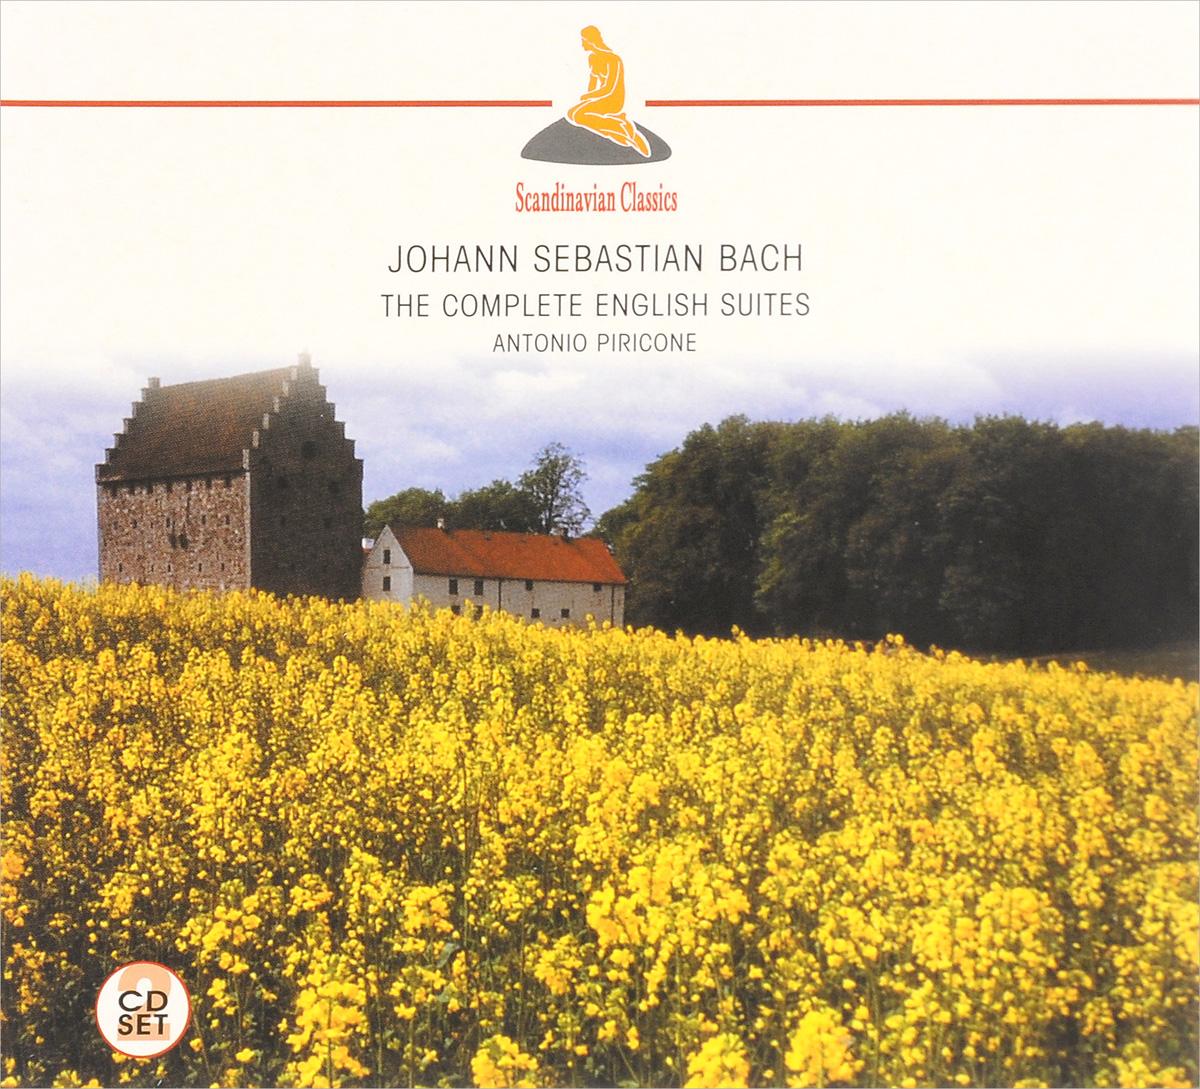 Antonio Piricone Scandinavian Classics. Antonio Piricone. Johann Sebastian Bach. The Complete English Suites (2 CD)